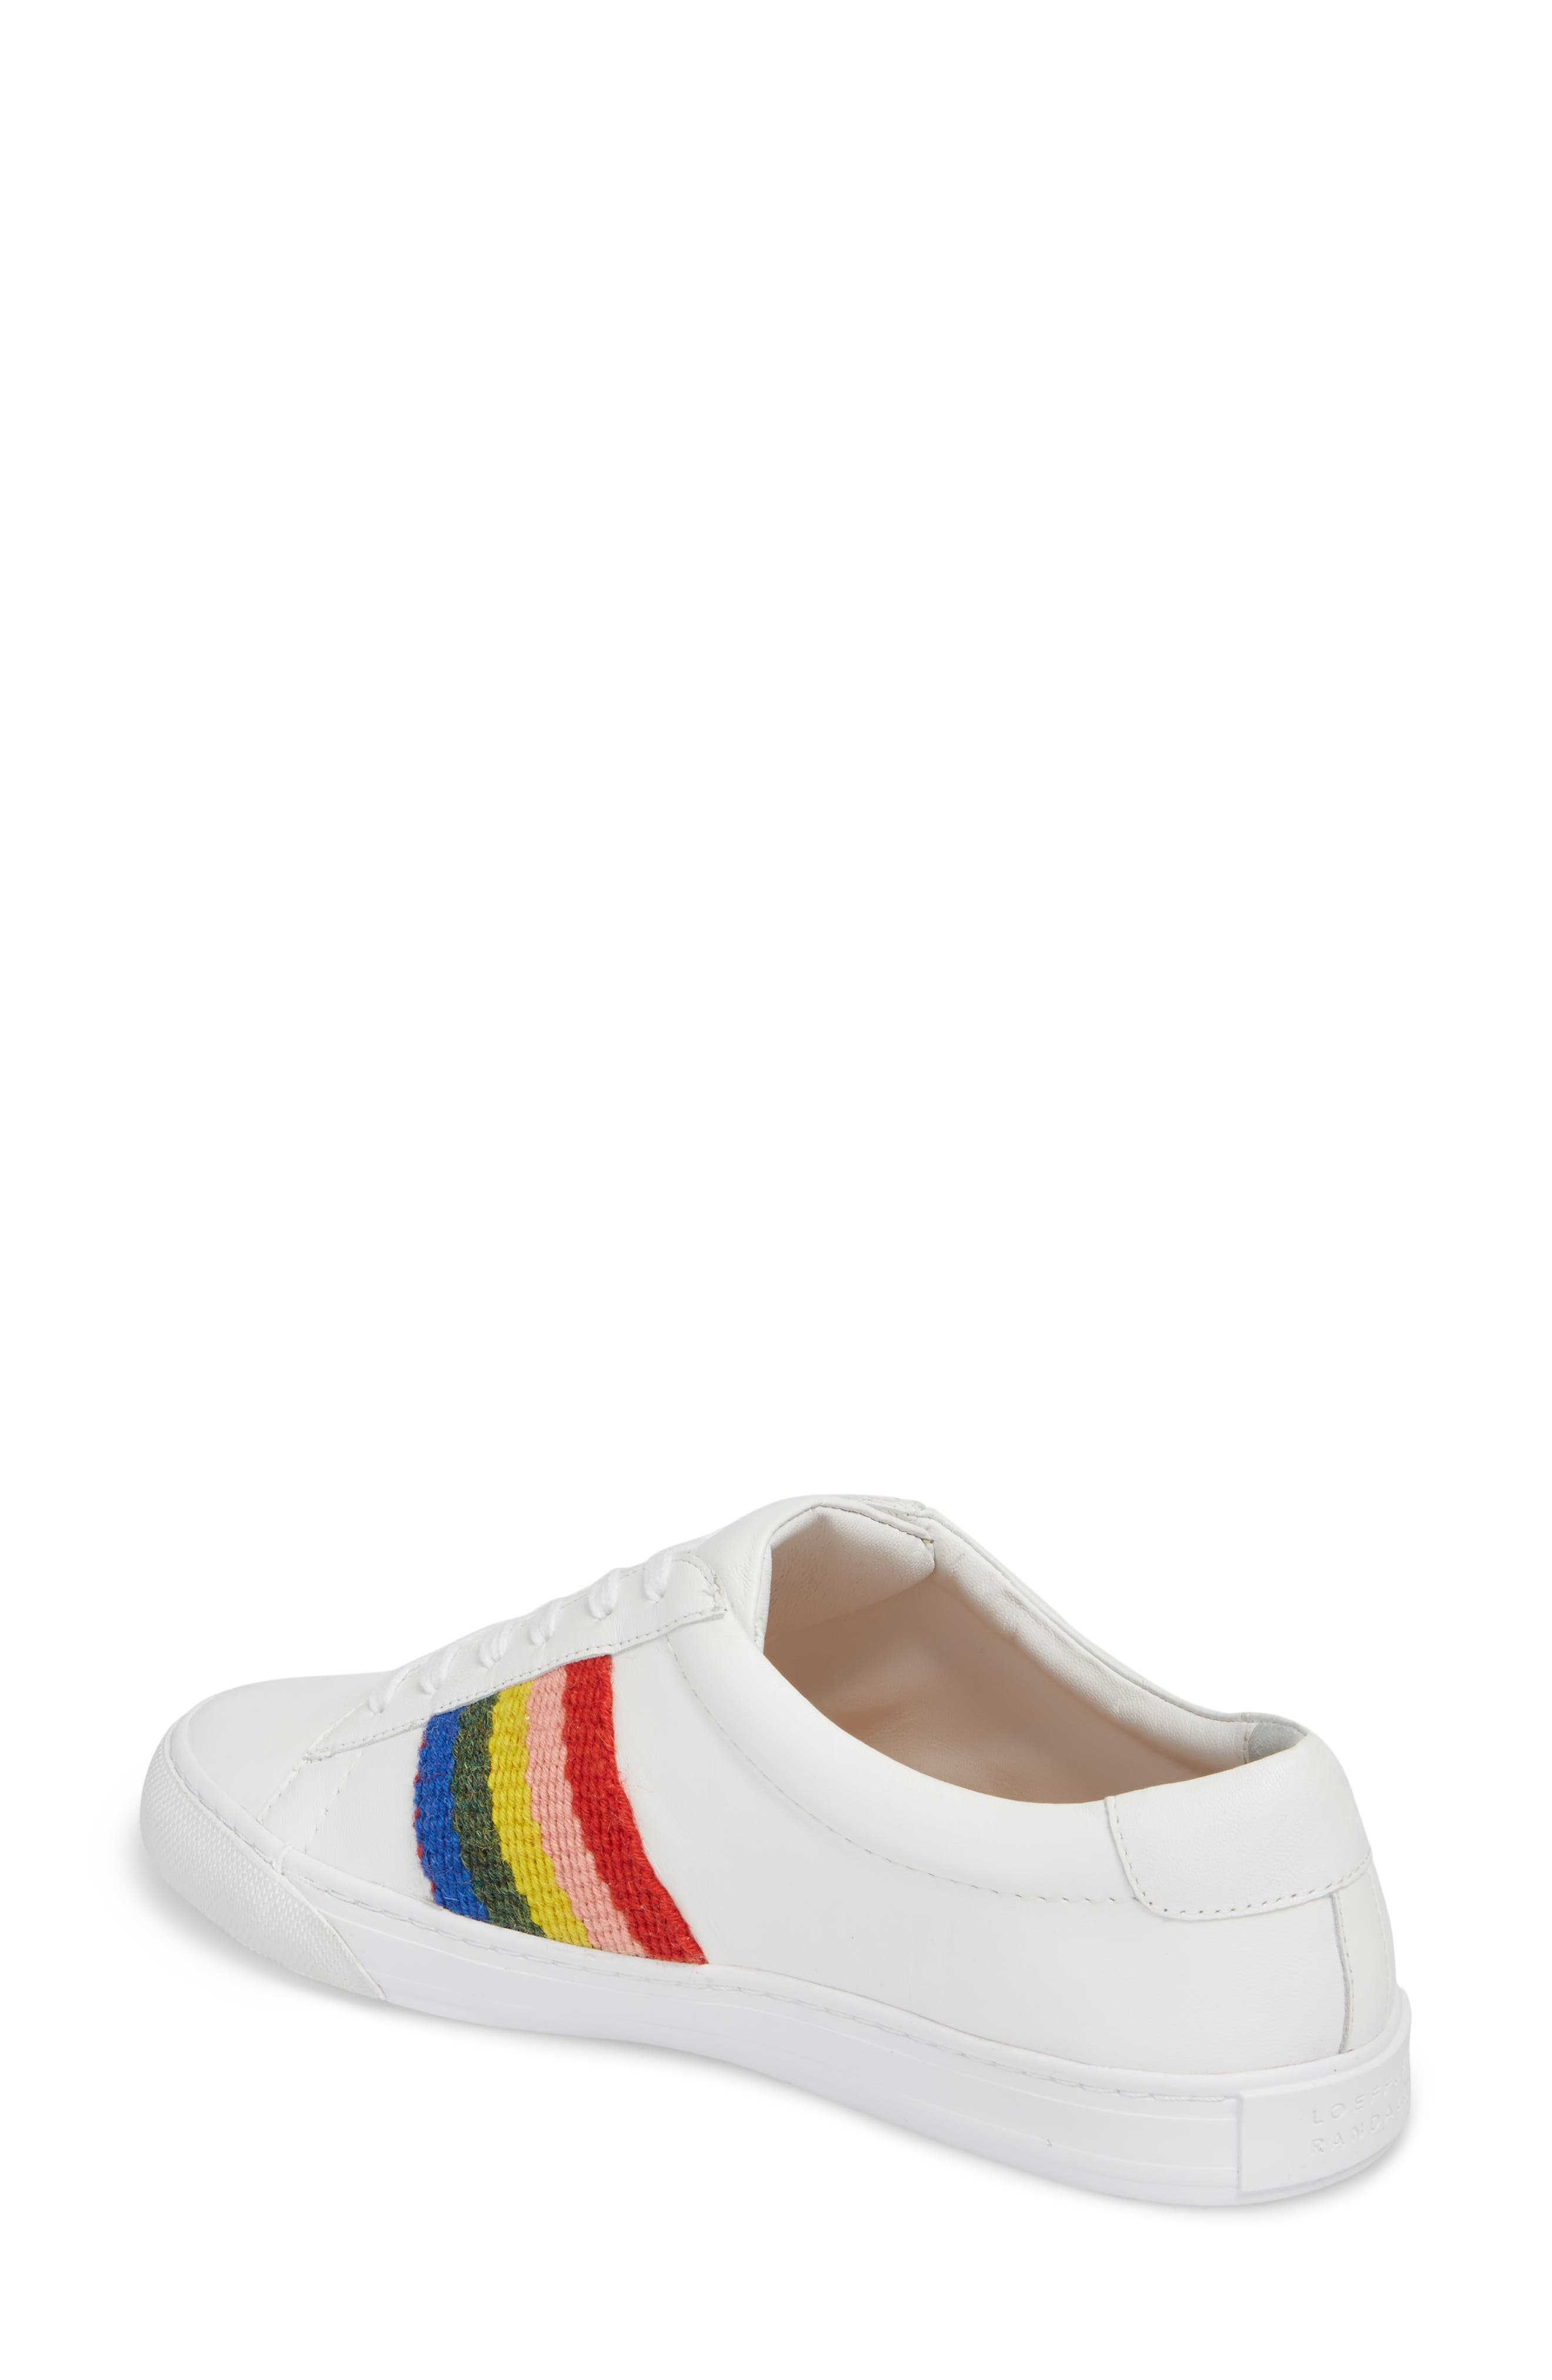 Logan Rainbow Sneaker,                             Alternate thumbnail 2, color,                             WHITE/ RAINBOW